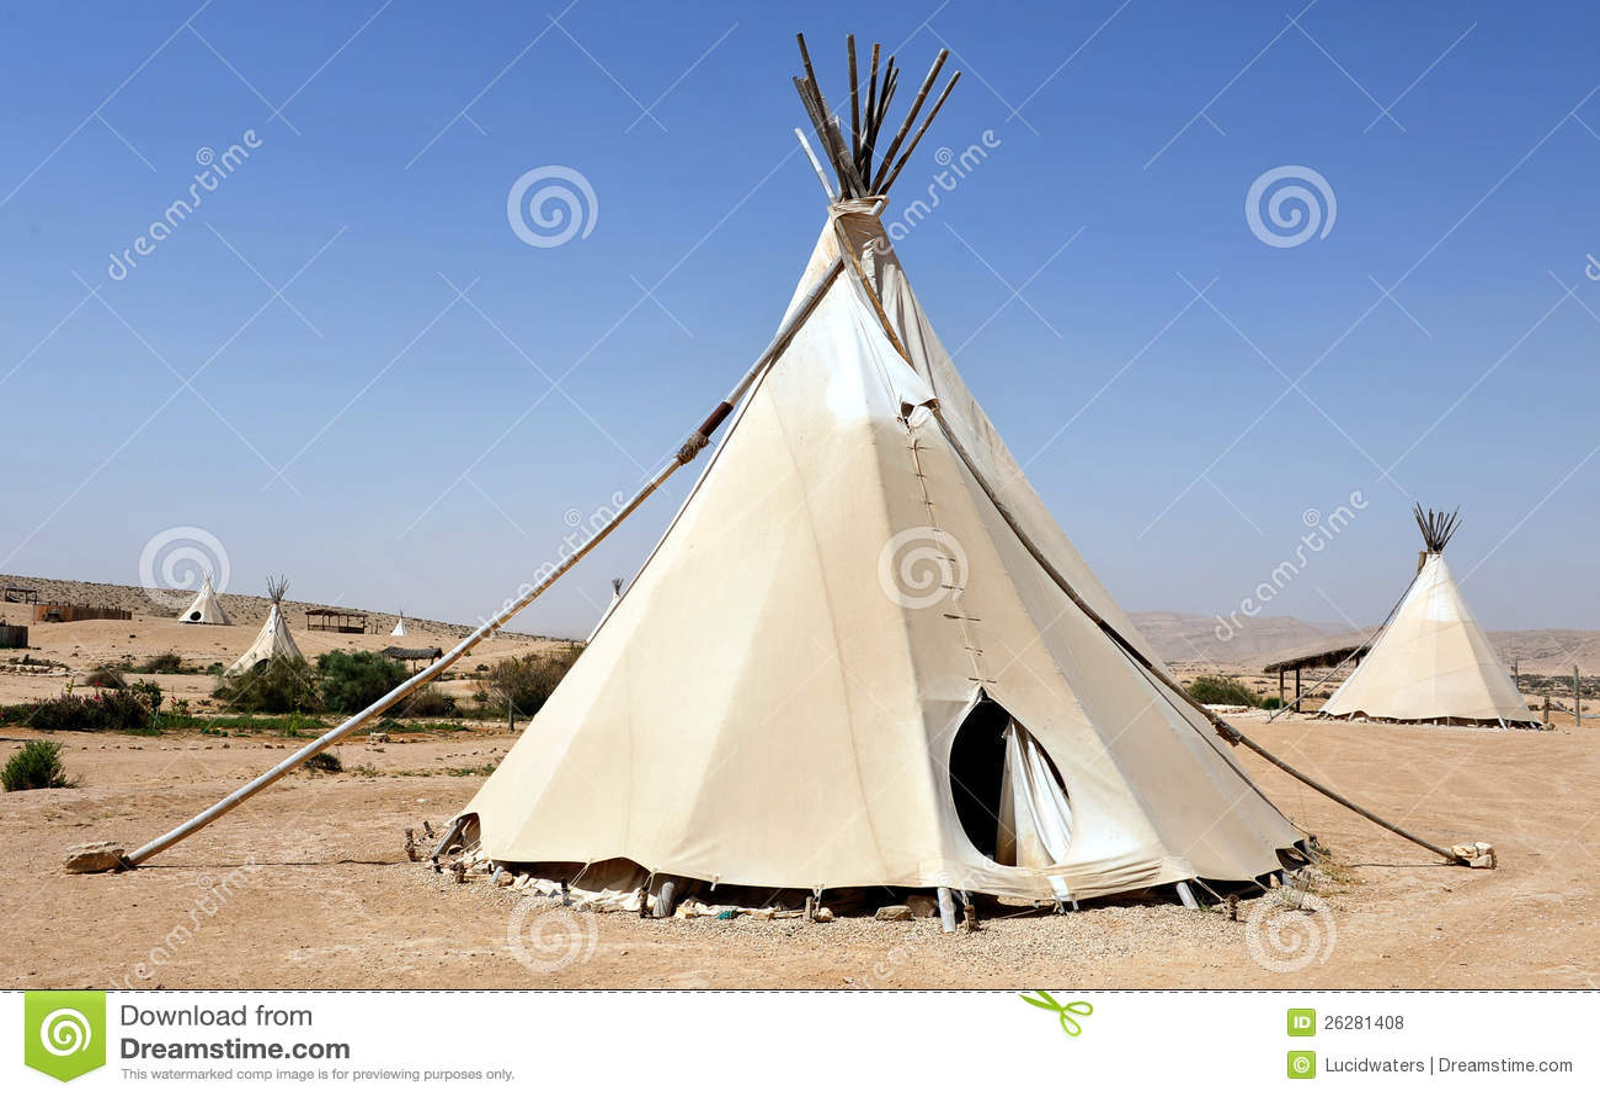 Tentes D 39 Indien De Tipi Photos Libres De Droits Image 26281408